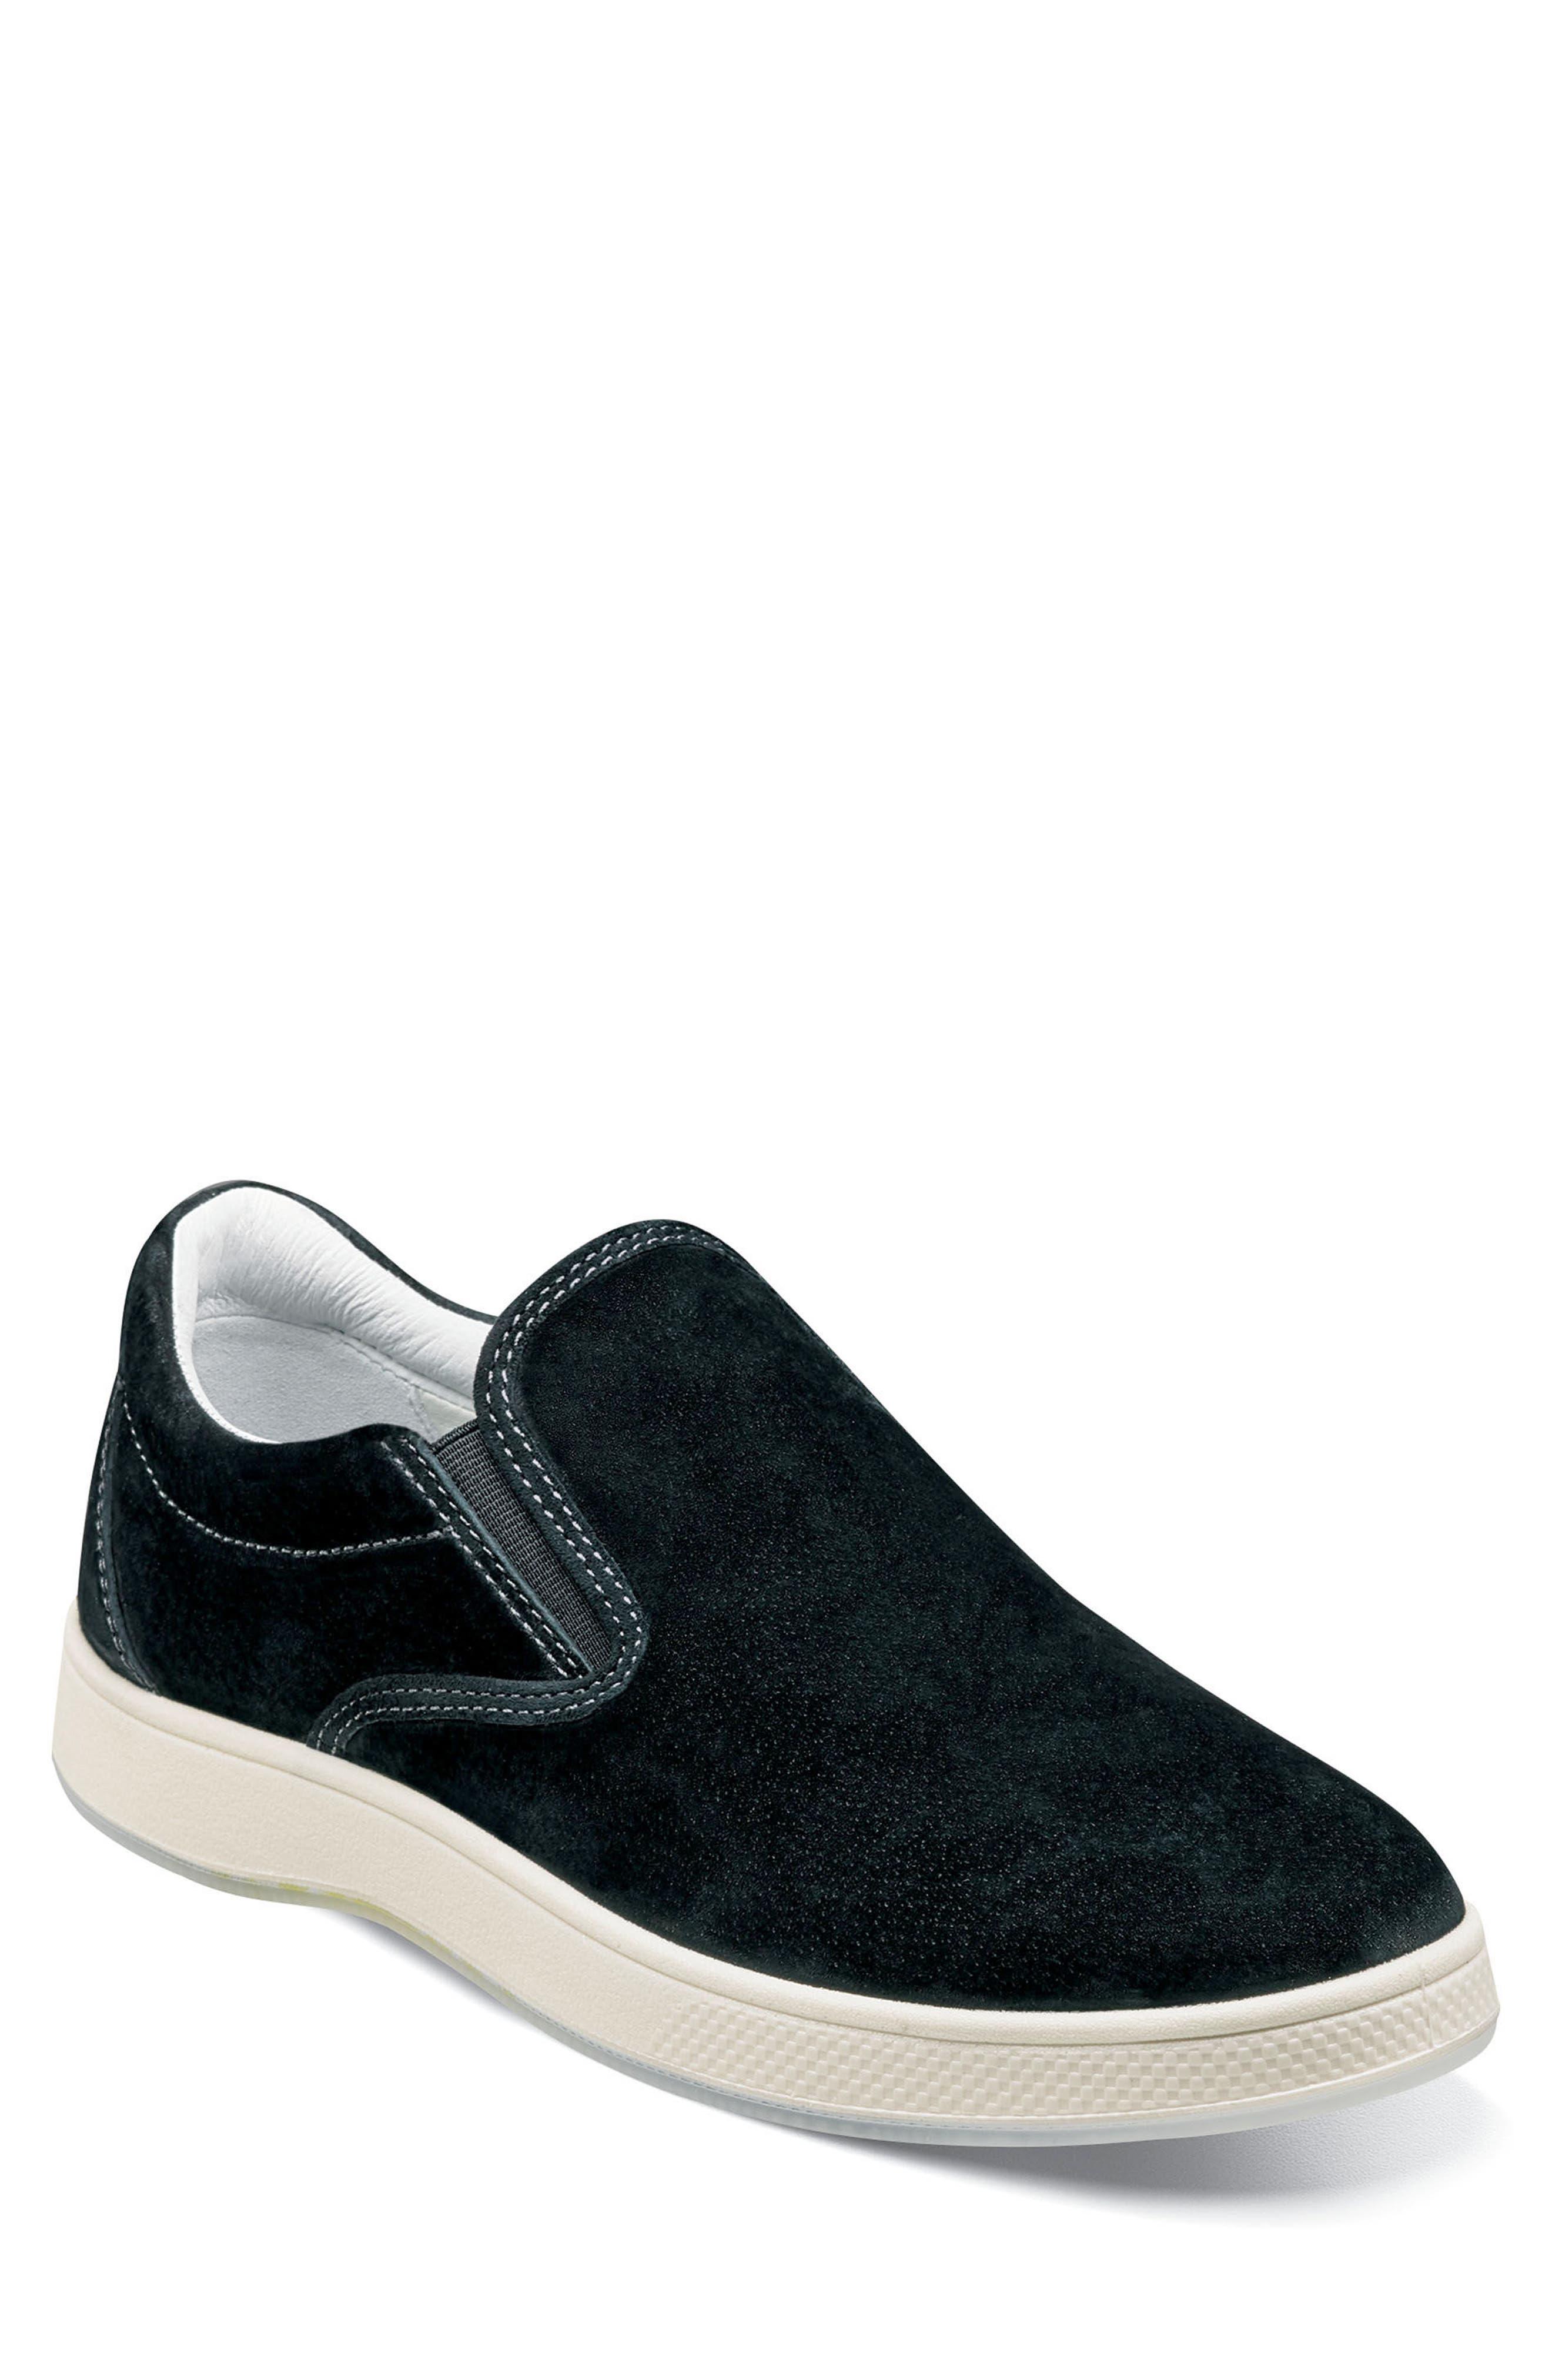 FLORSHEIM Edge Slip-On Sneaker, Main, color, 001